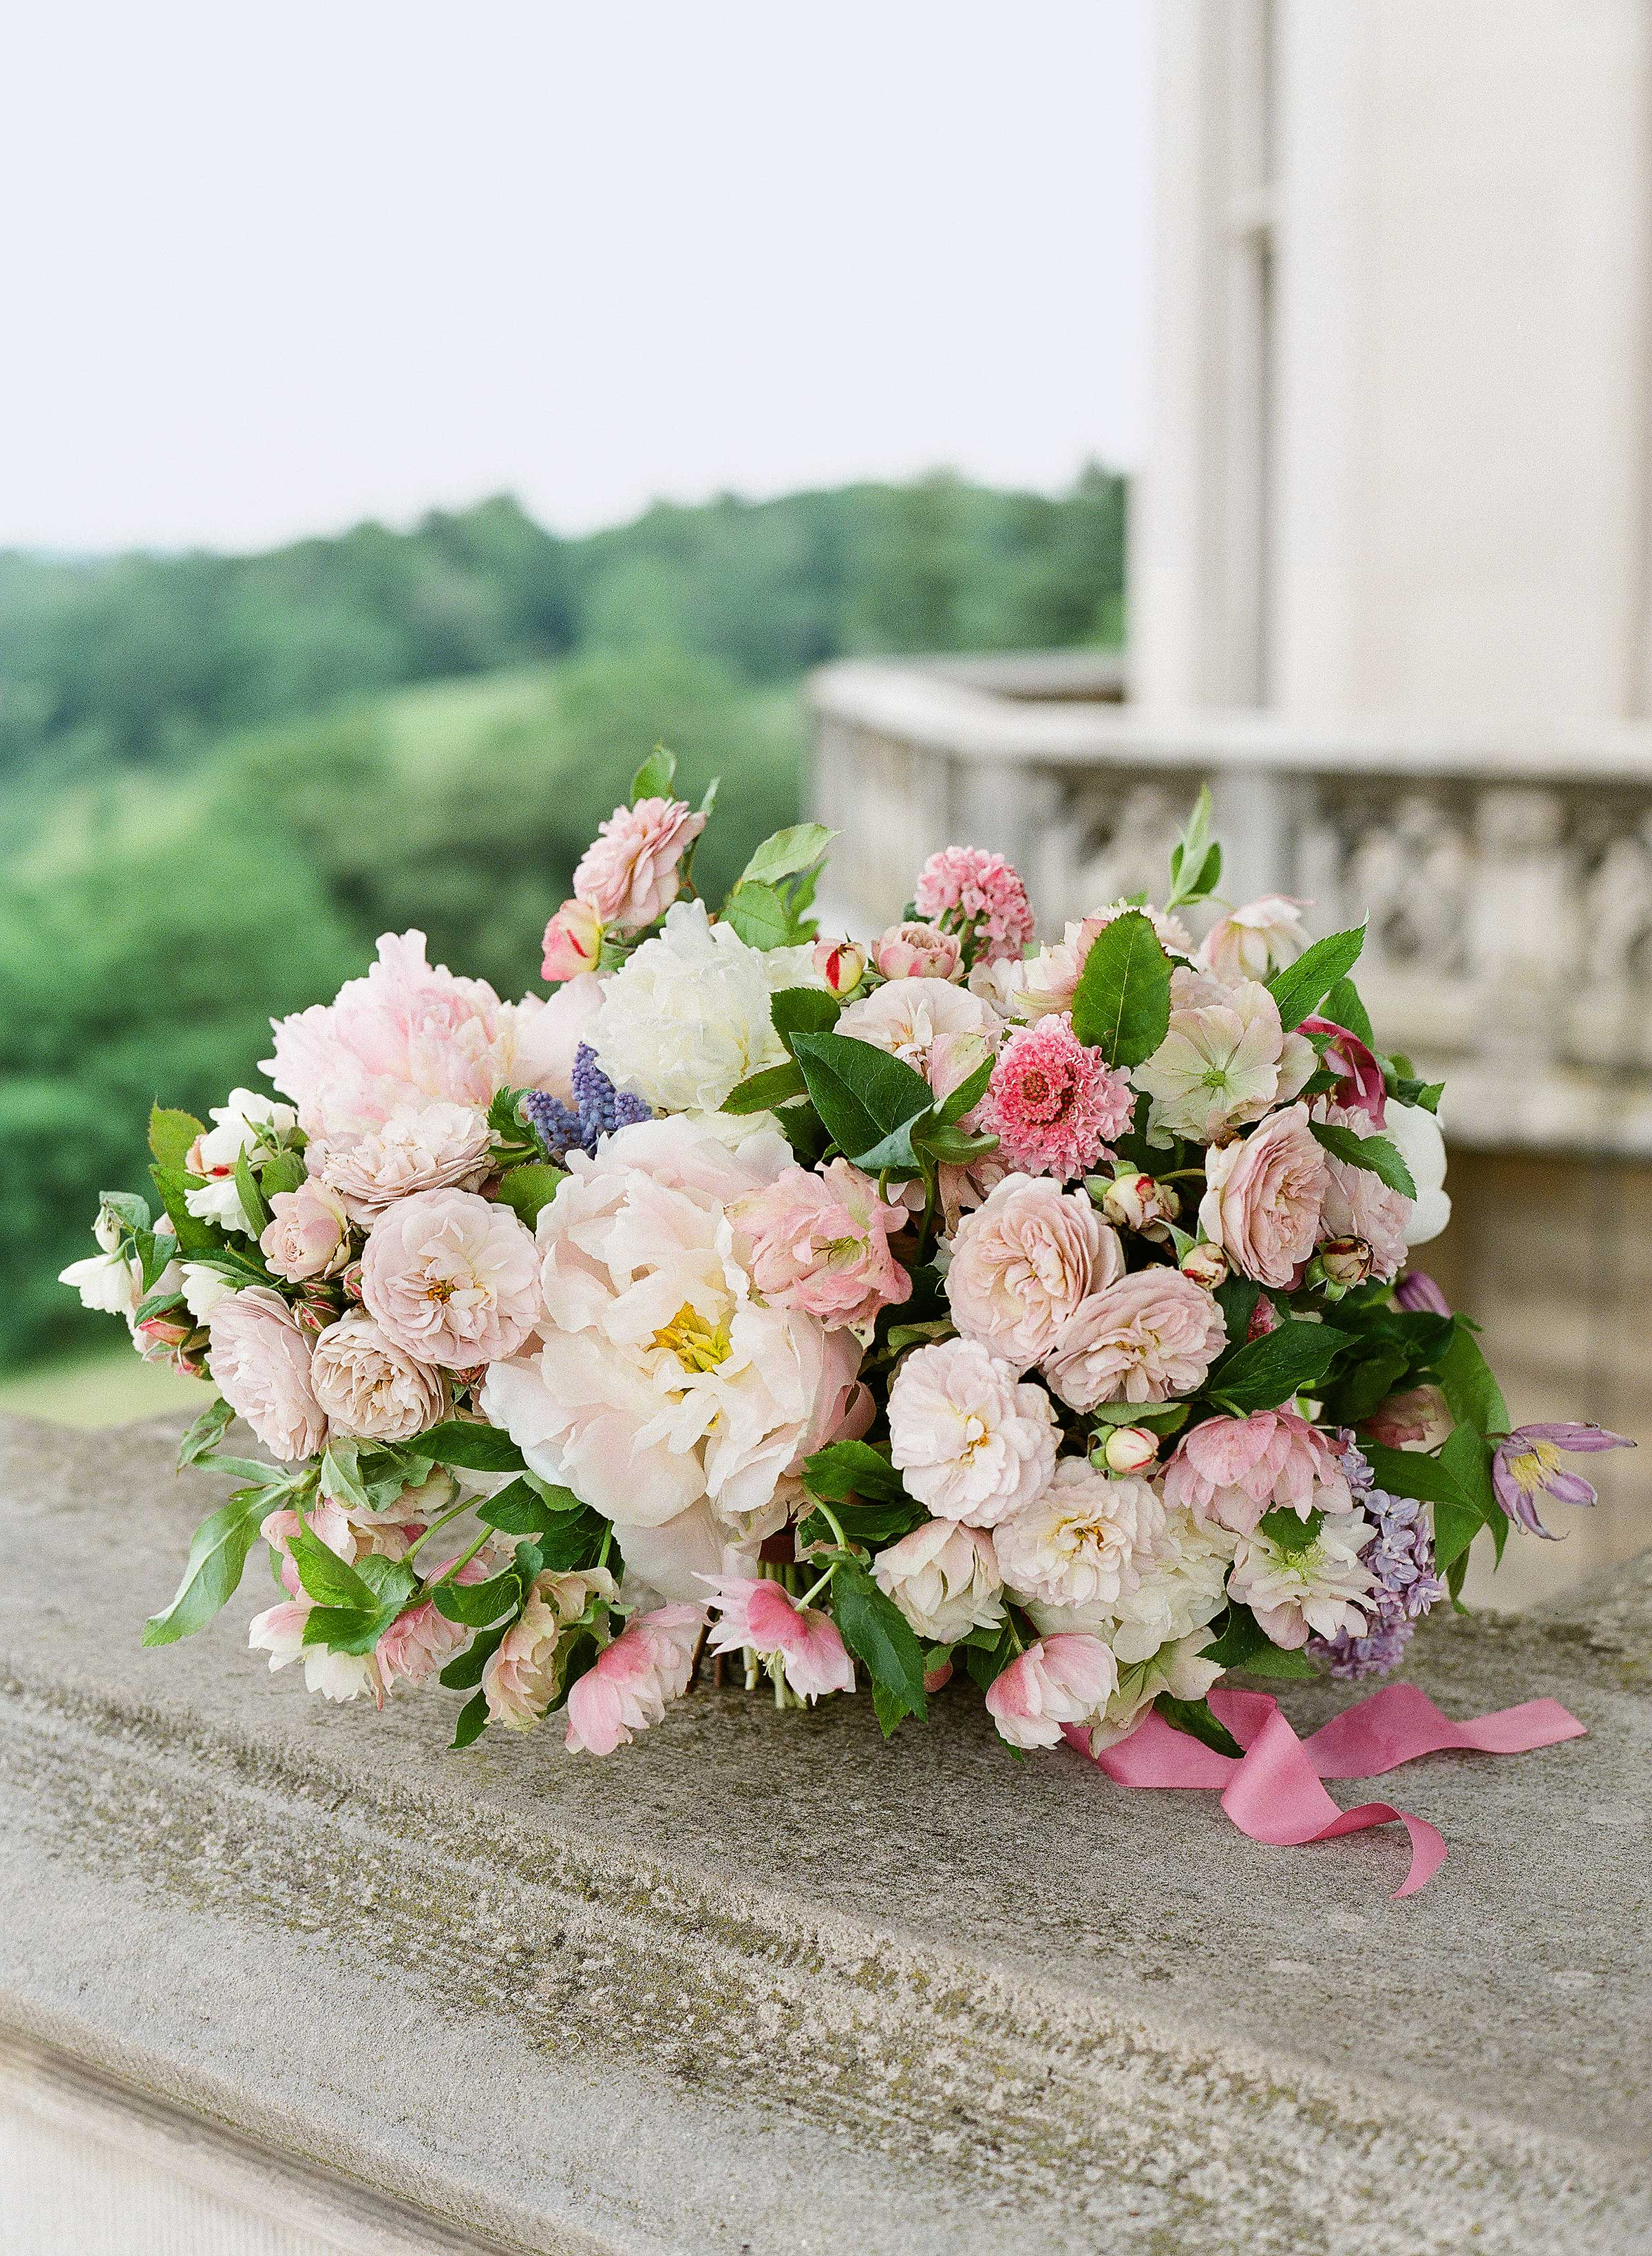 rebecca-clay-wedding-north-carolina-bouquet-103228796.jpg